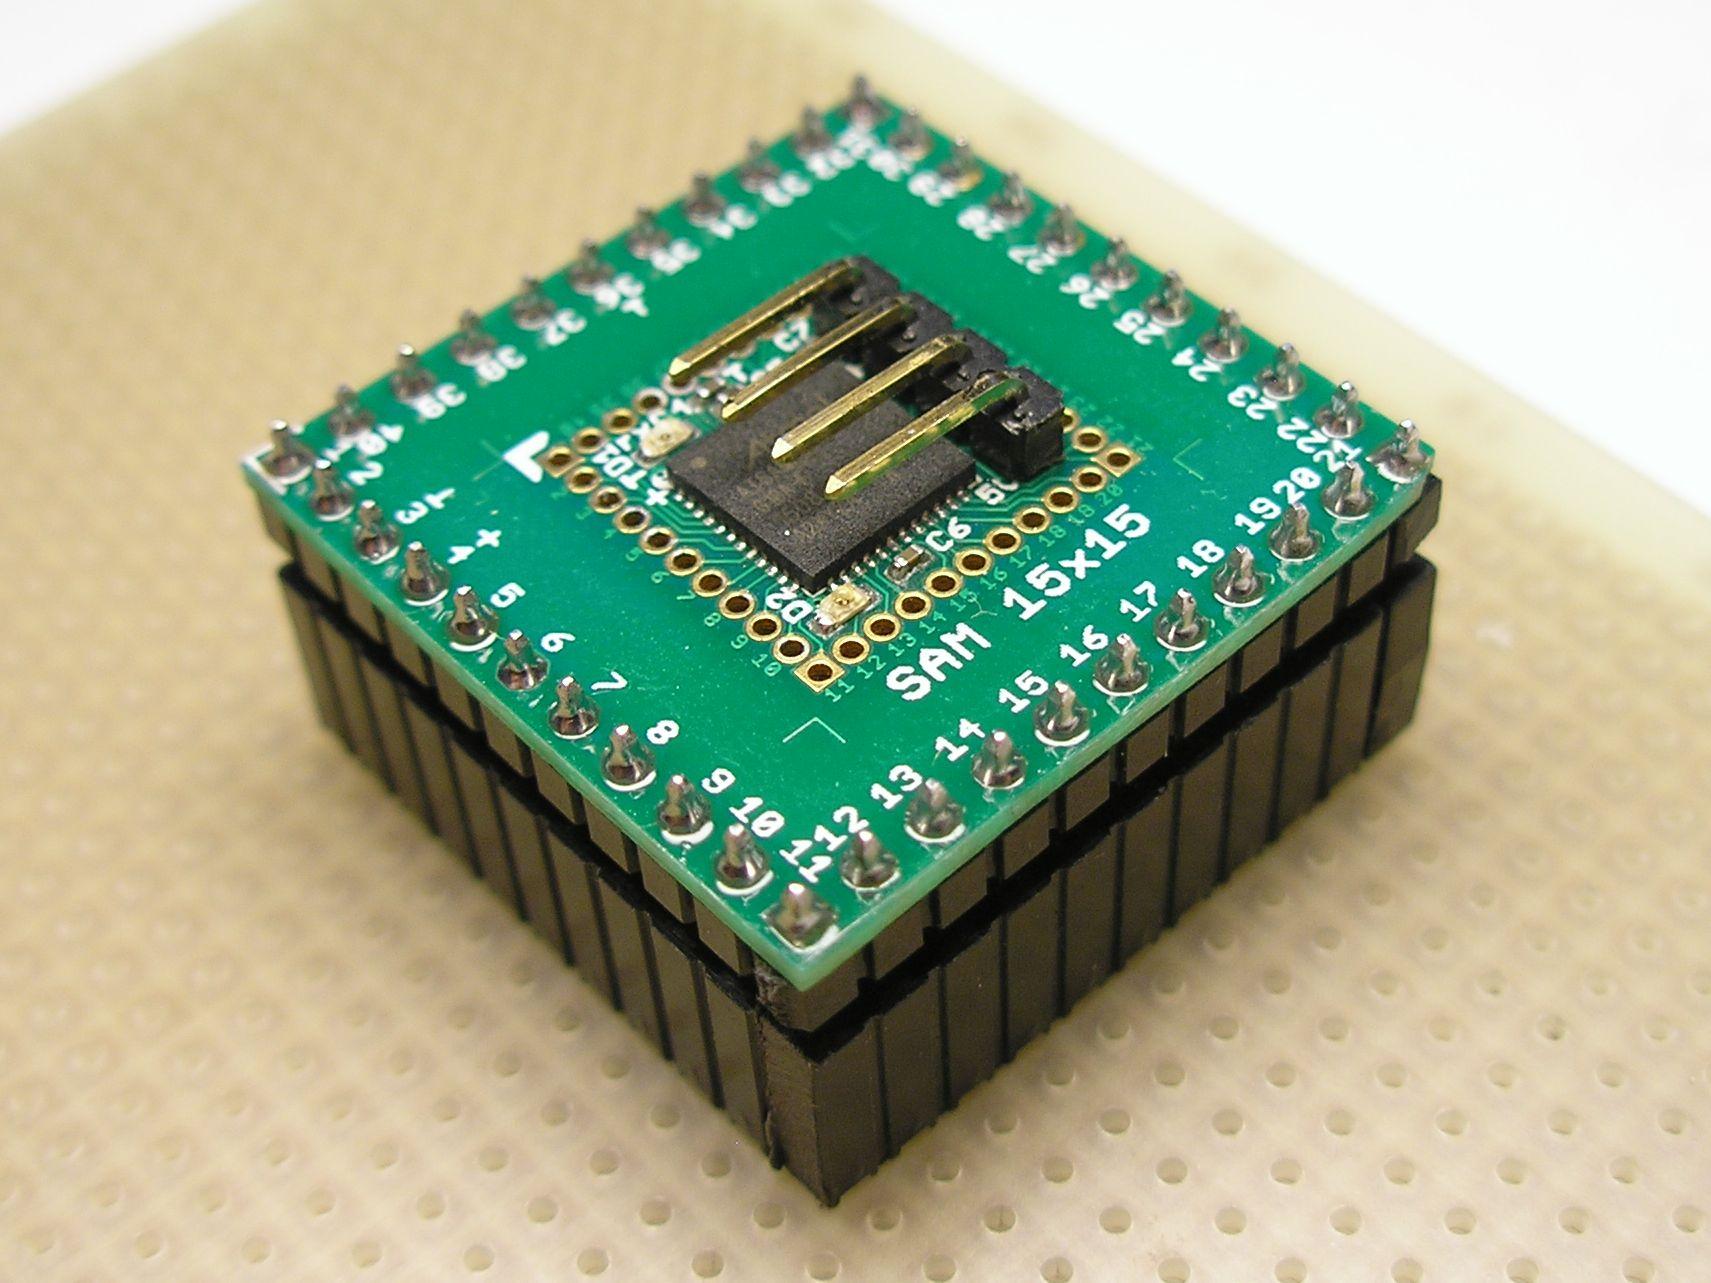 Picture of SAM 15x15 Arduino Compatible Development Board 15x15mm With SAMD21G18